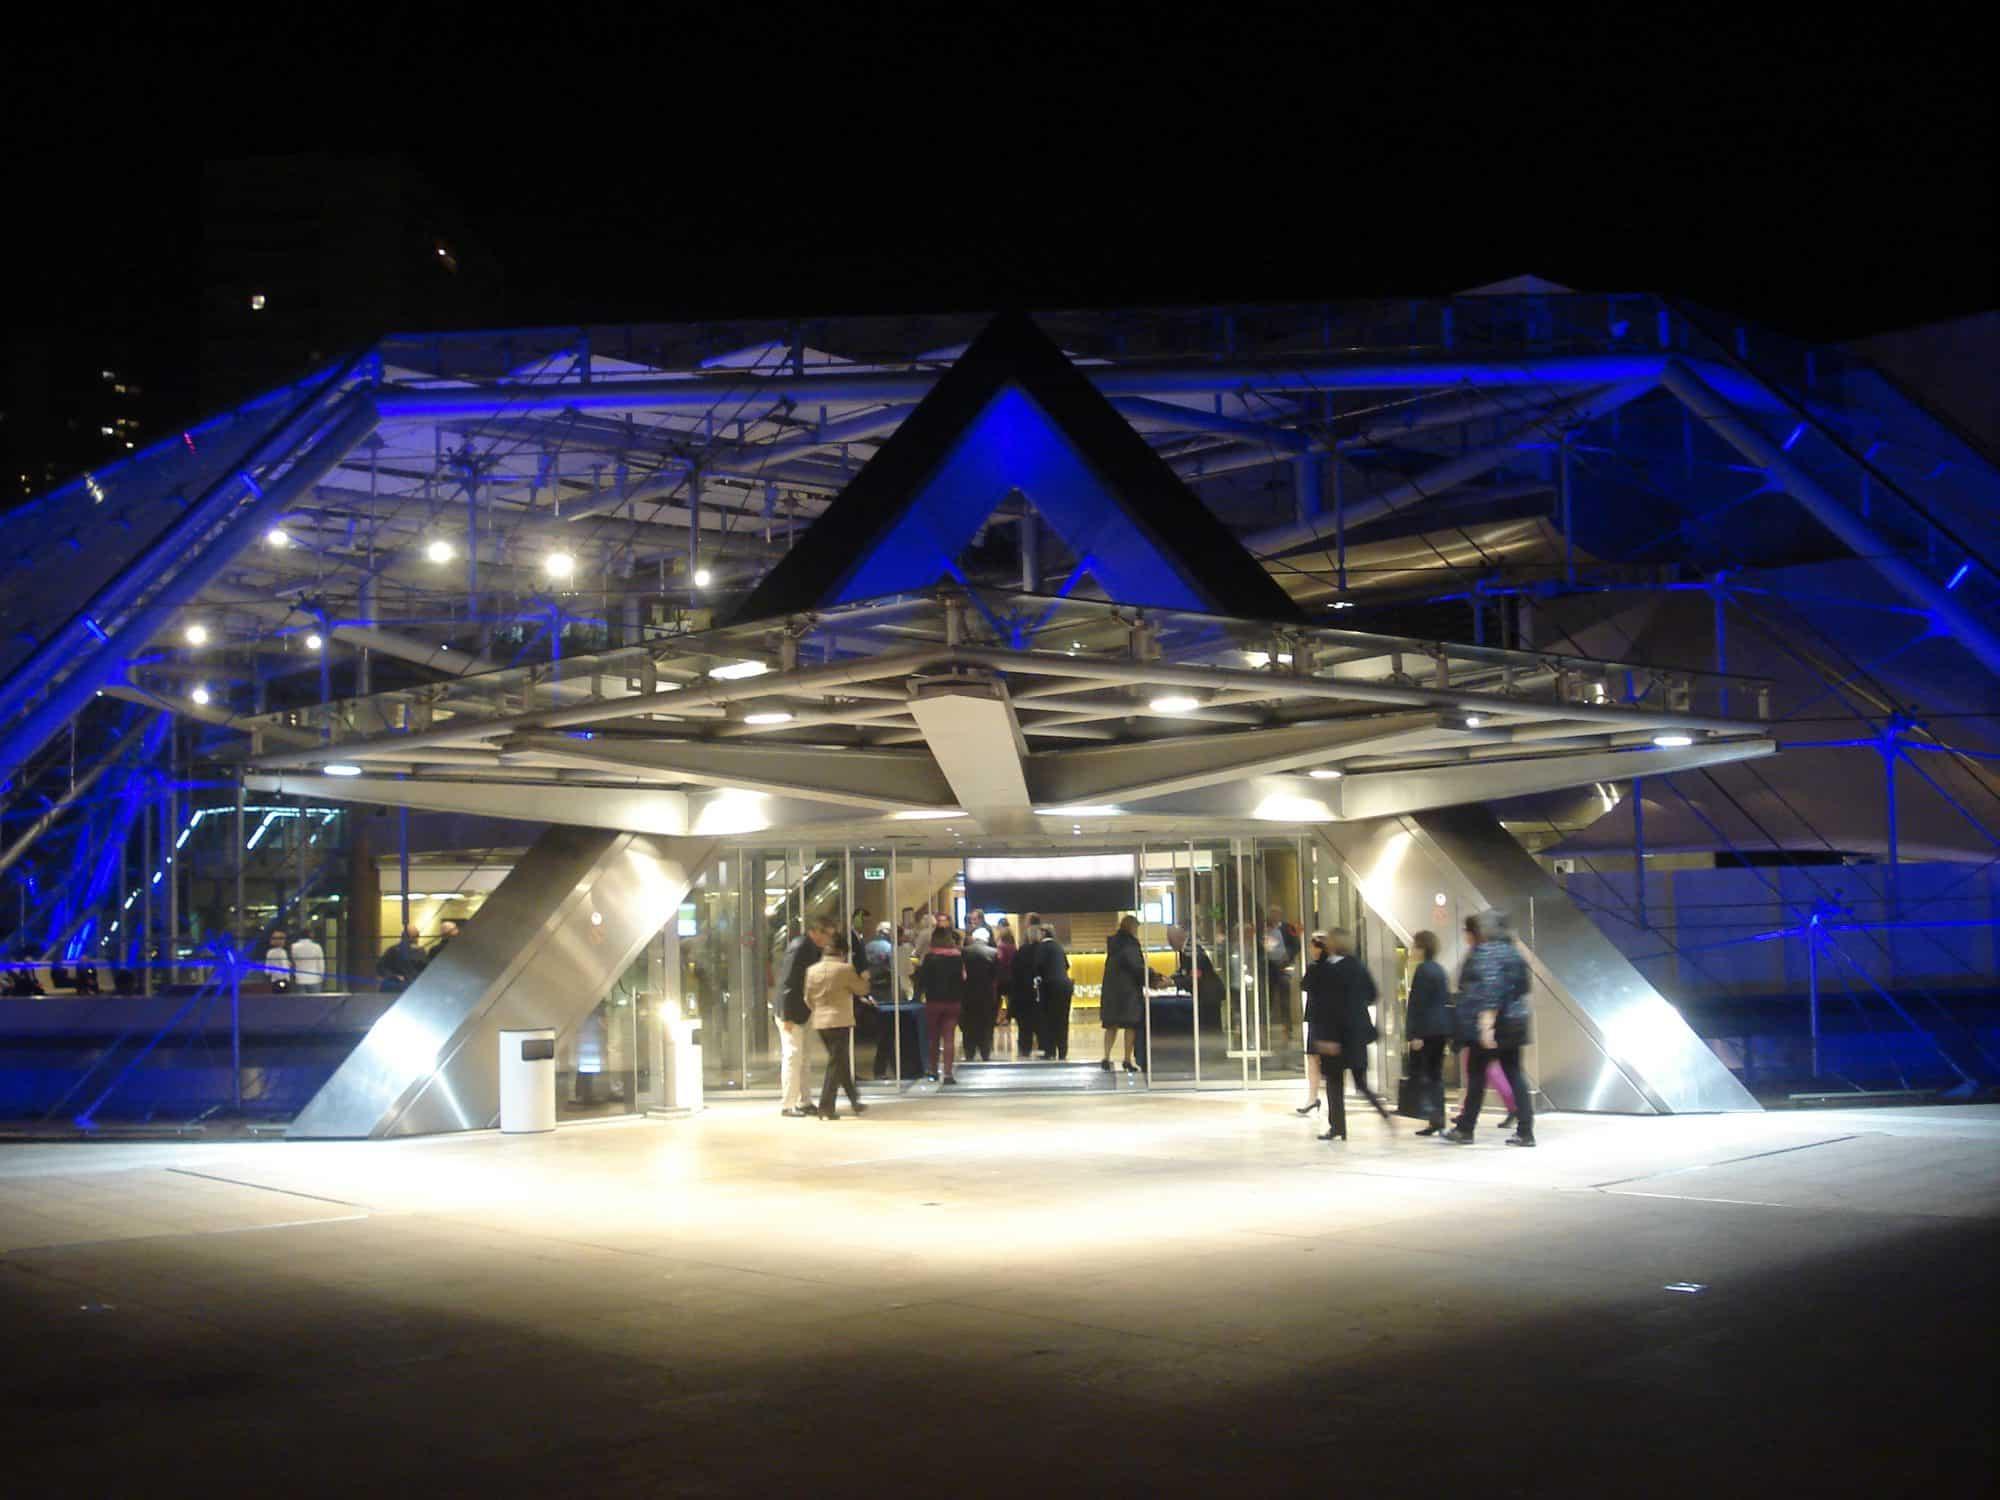 Le-Grimaldi-Forum-de-Monaco-©Alexandre-Calleau